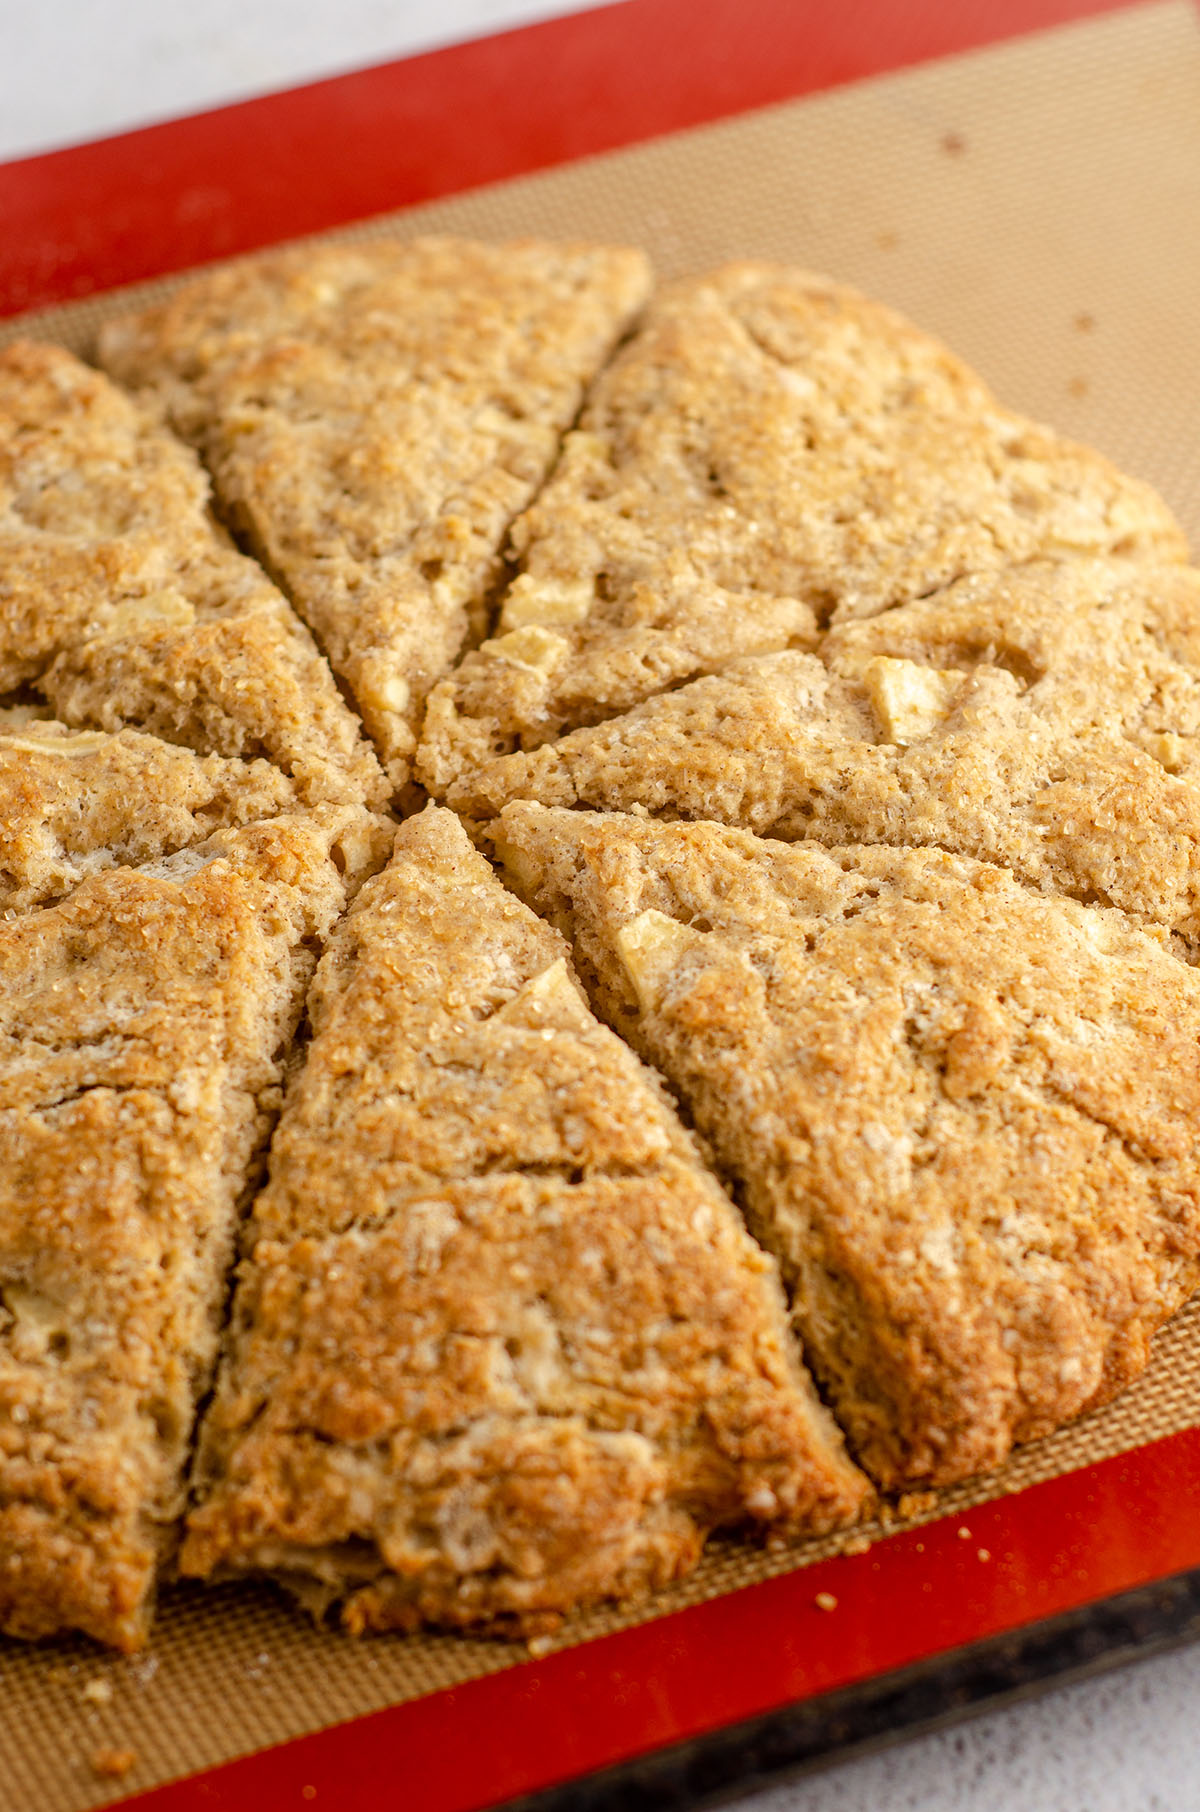 baked golden brown scones on baking sheet